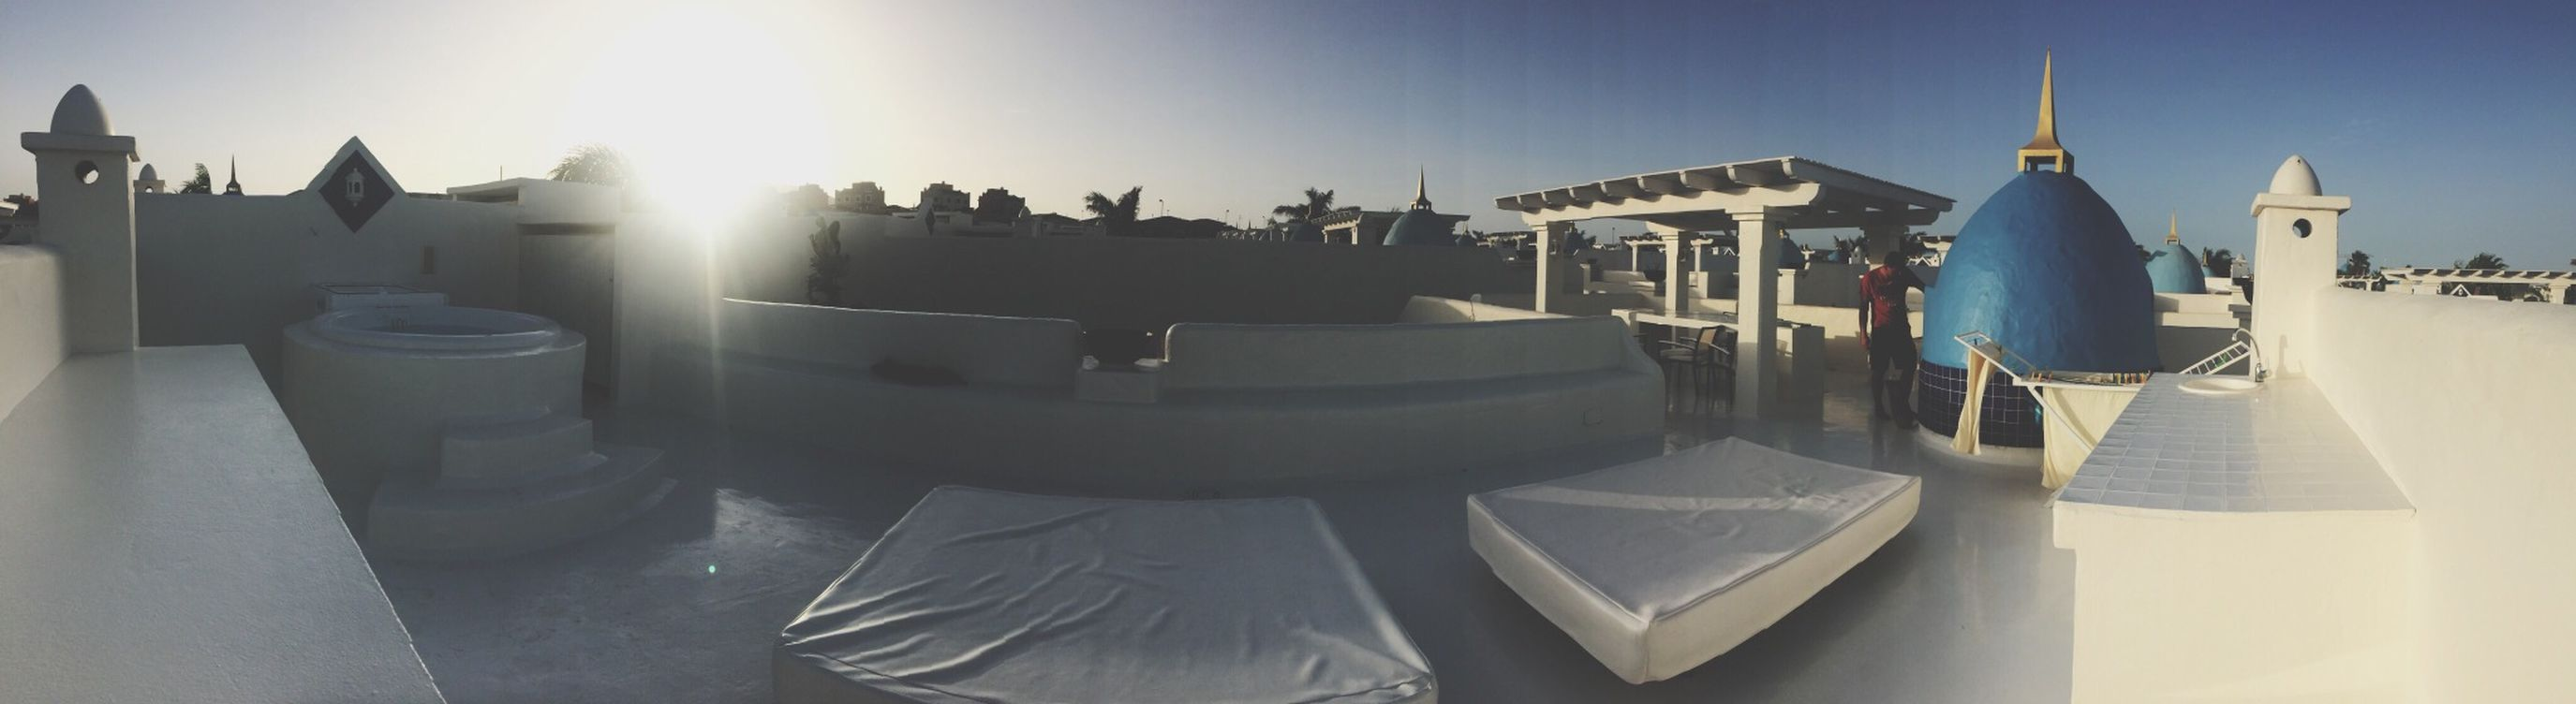 Holidayhome Holiday Summer Fuerteventura